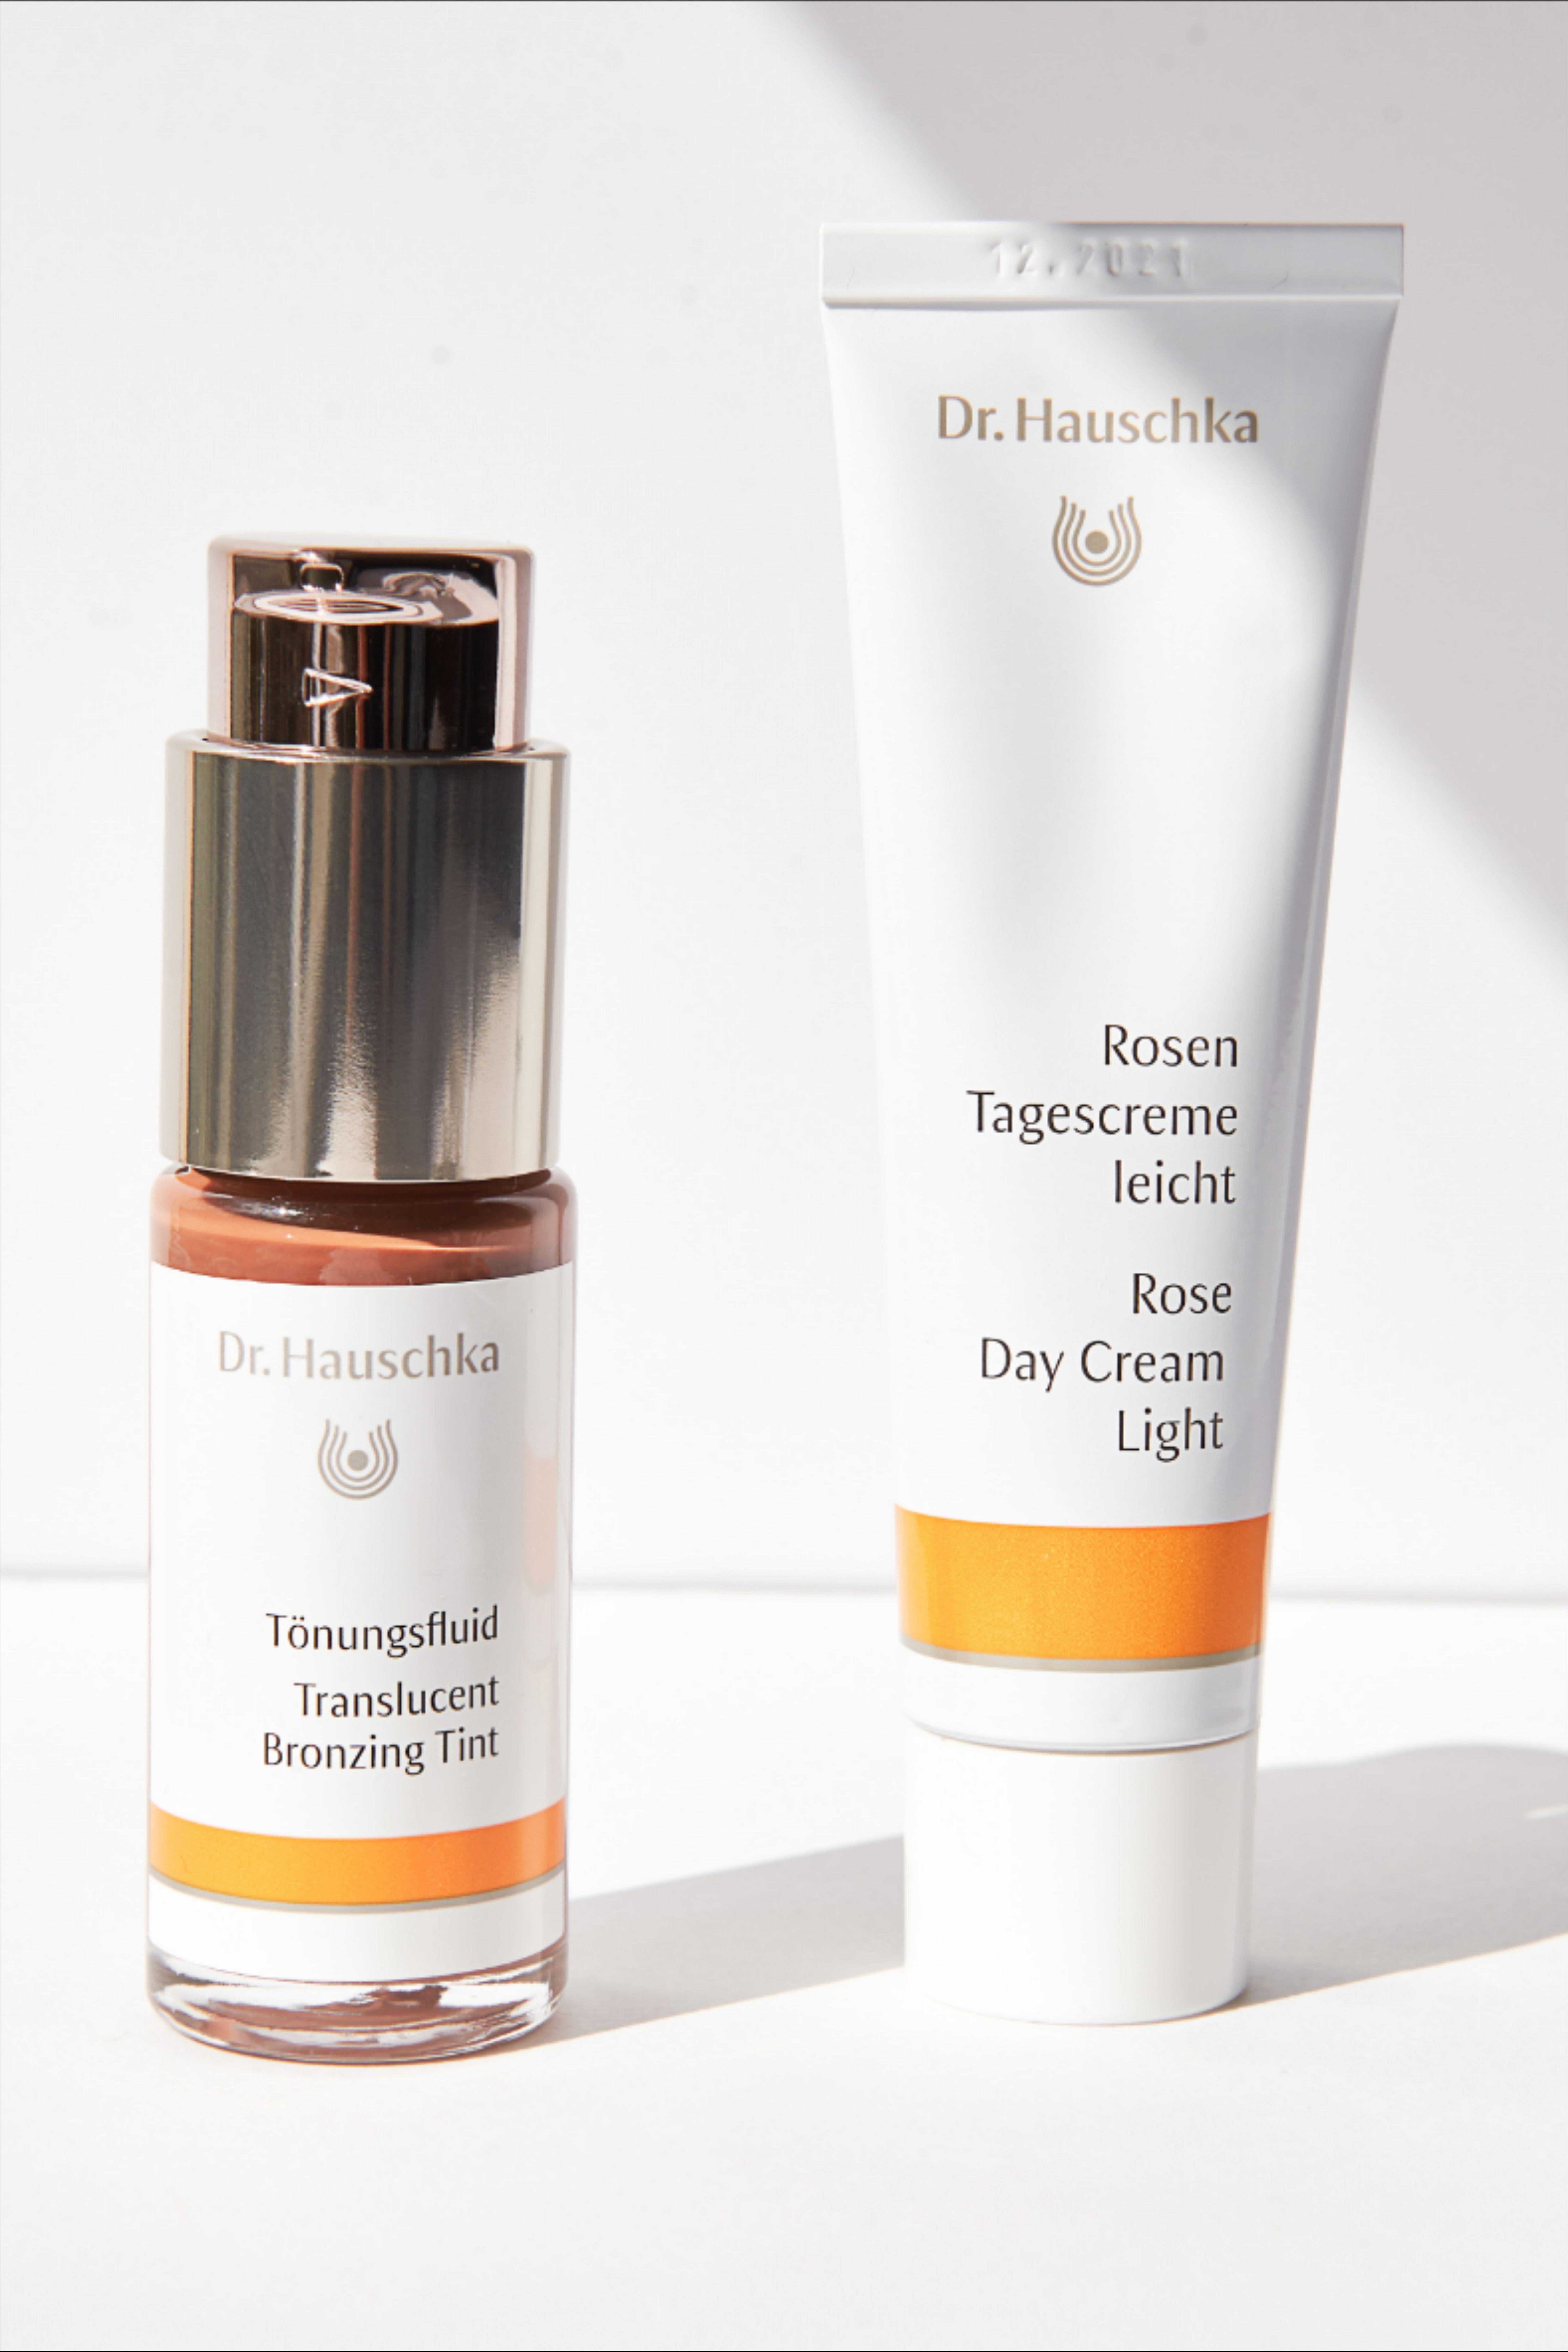 Dr Hauschka Translucent Bronzing Tint Dr Hauschka In 2020 Bronzing Tints Natural Cosmetics